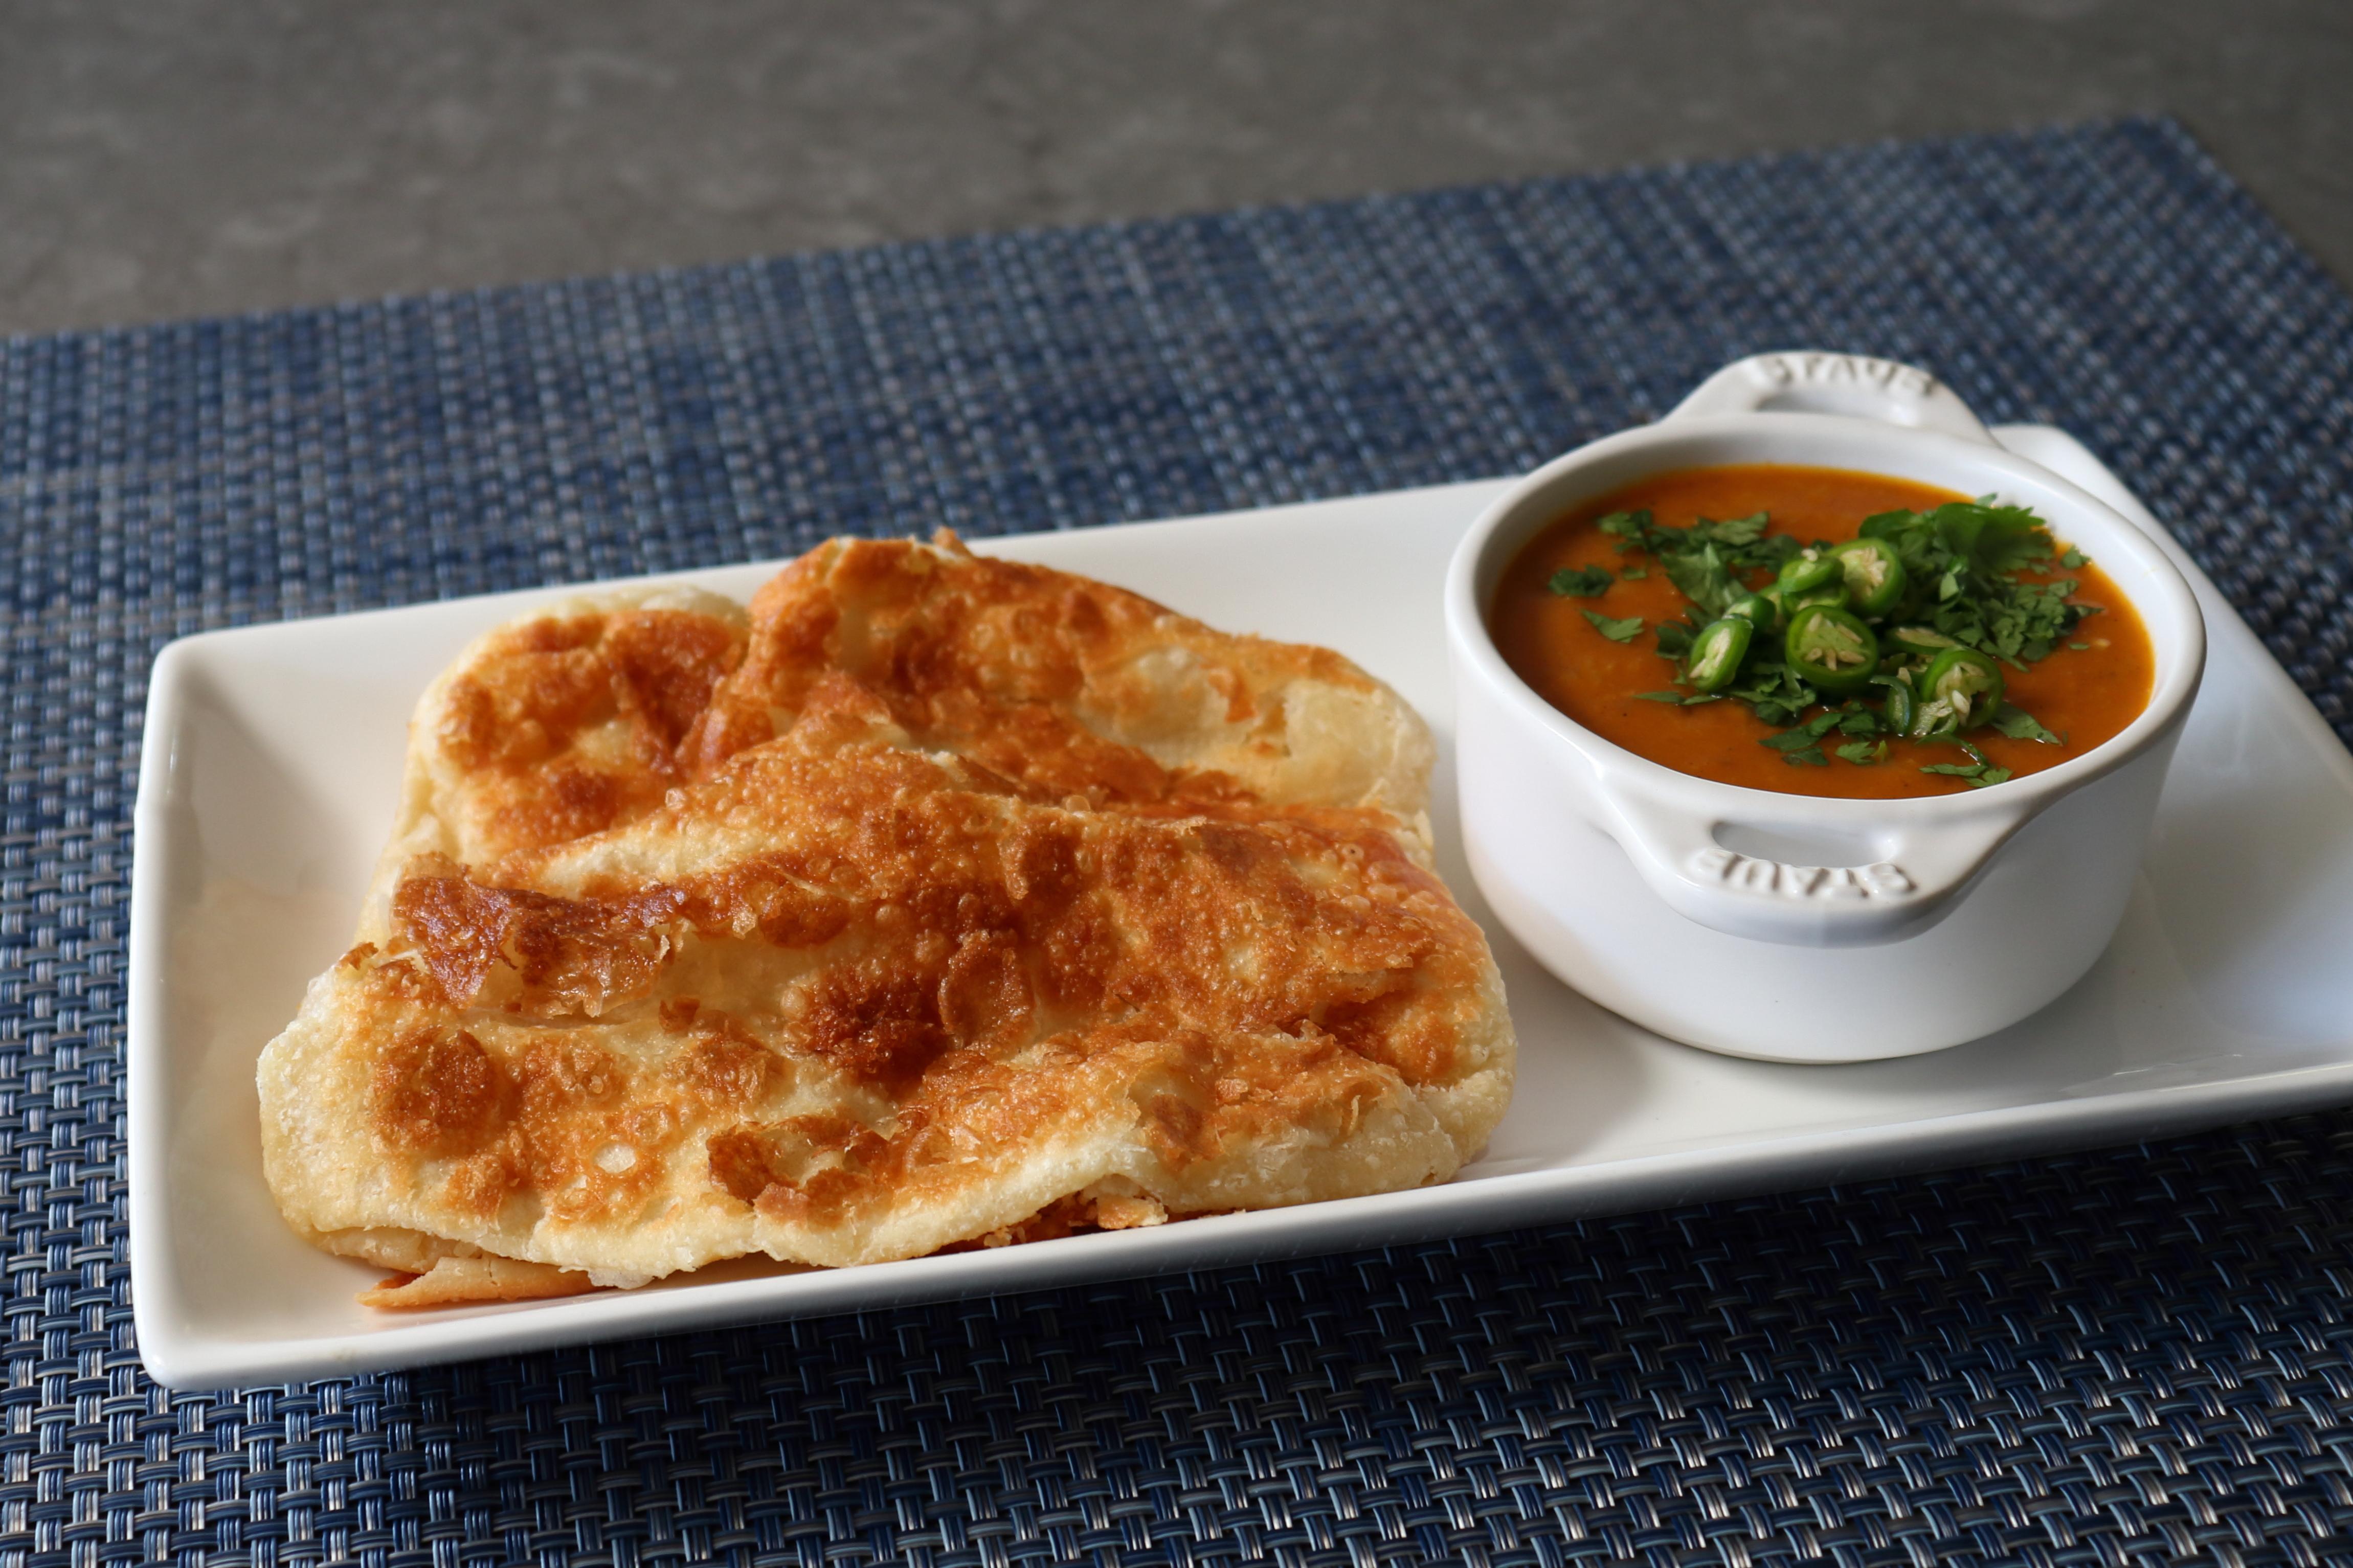 Malaysian Flatbread (Roti Canai) with Curried Lentil Dip Chef John